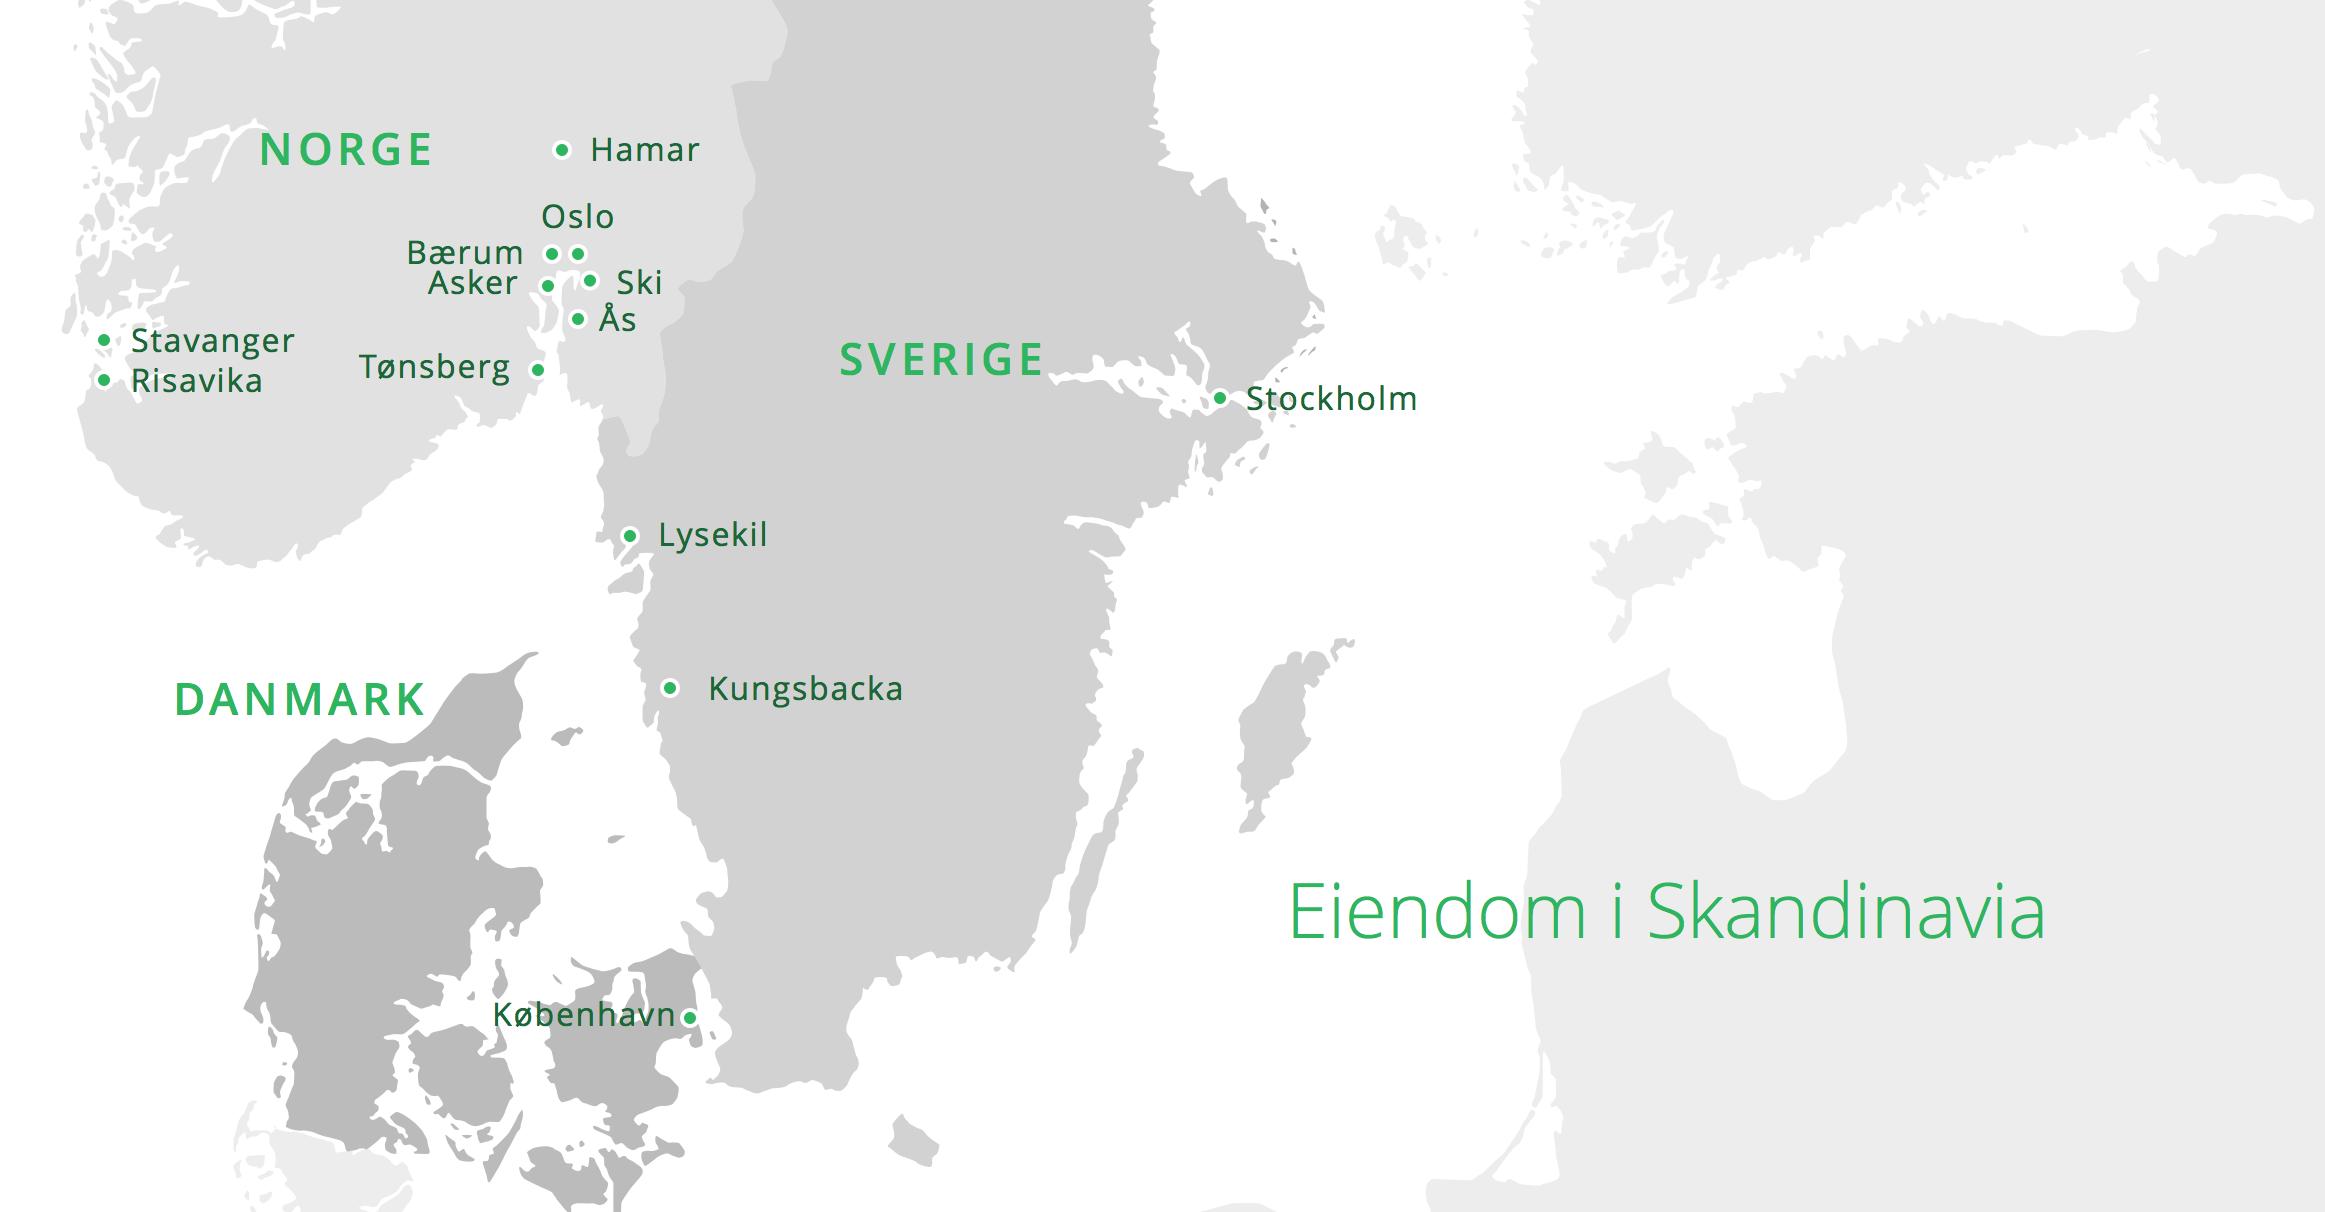 Eiendom i Skandinavia